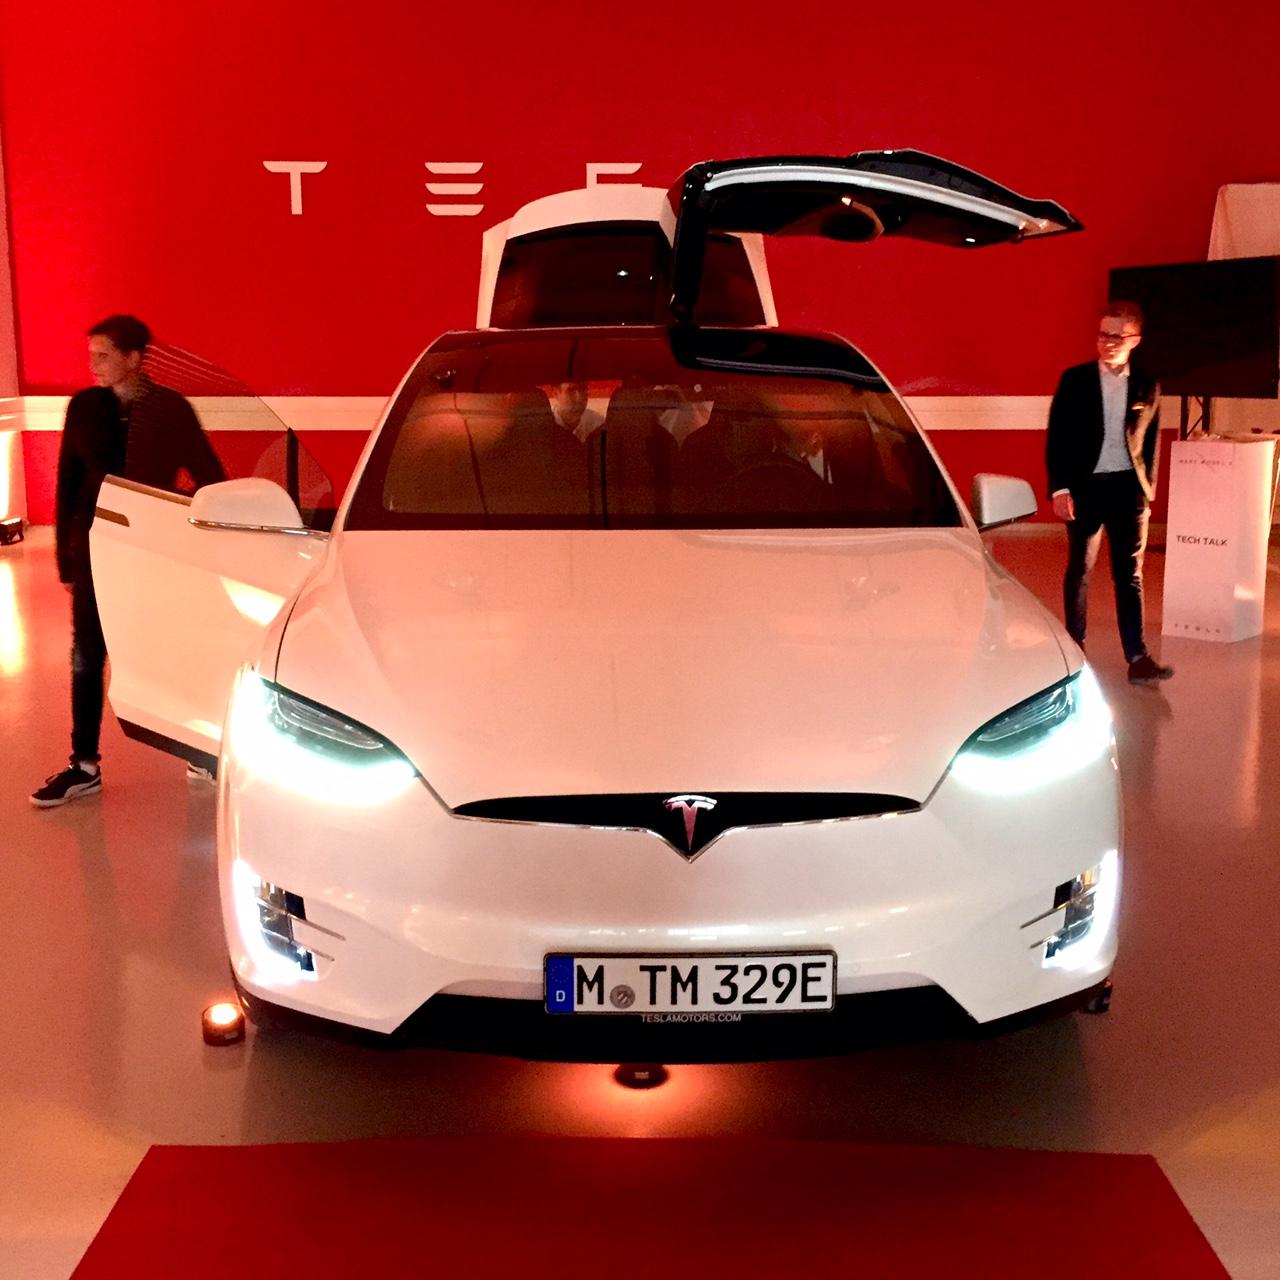 Tesla Roadster Interior Tesla Roadster Coming Soon Widodh: Norway: Test Drive With Tesla Model X